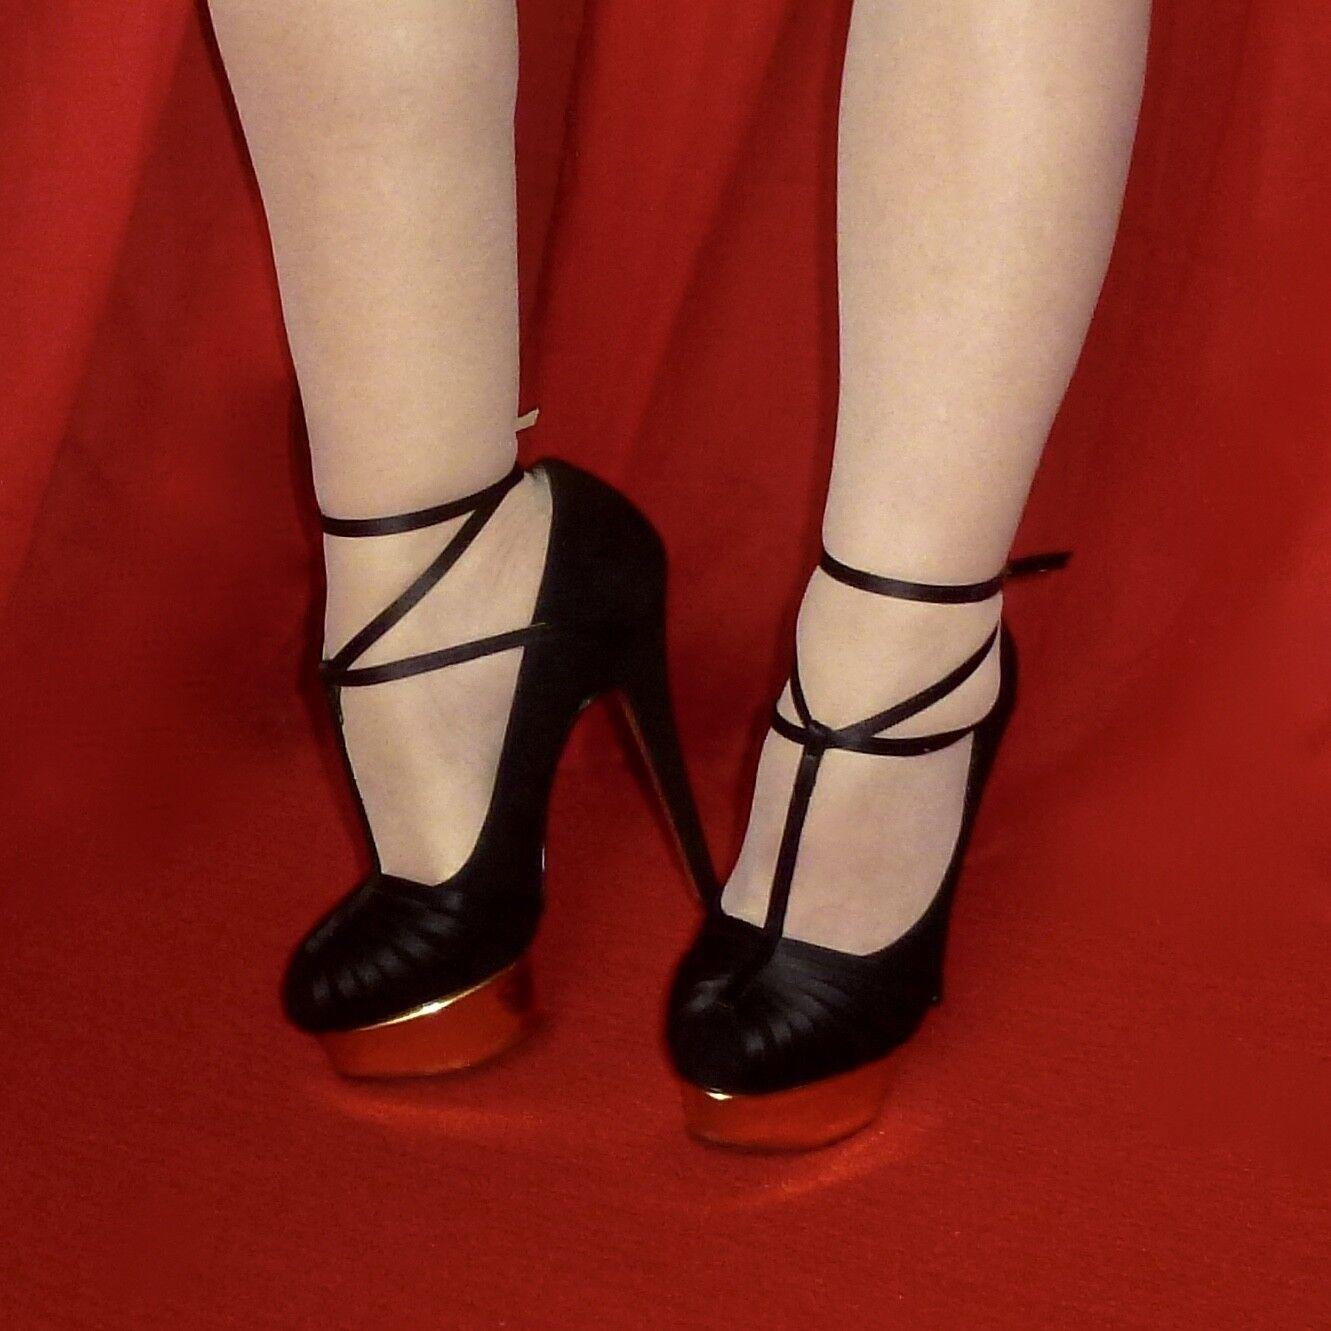 875 Charlotte Olympia Dolly en Satin Noir Noir Noir or Plateforme Cheville T Sangle 37 6.5 Rare 49d413